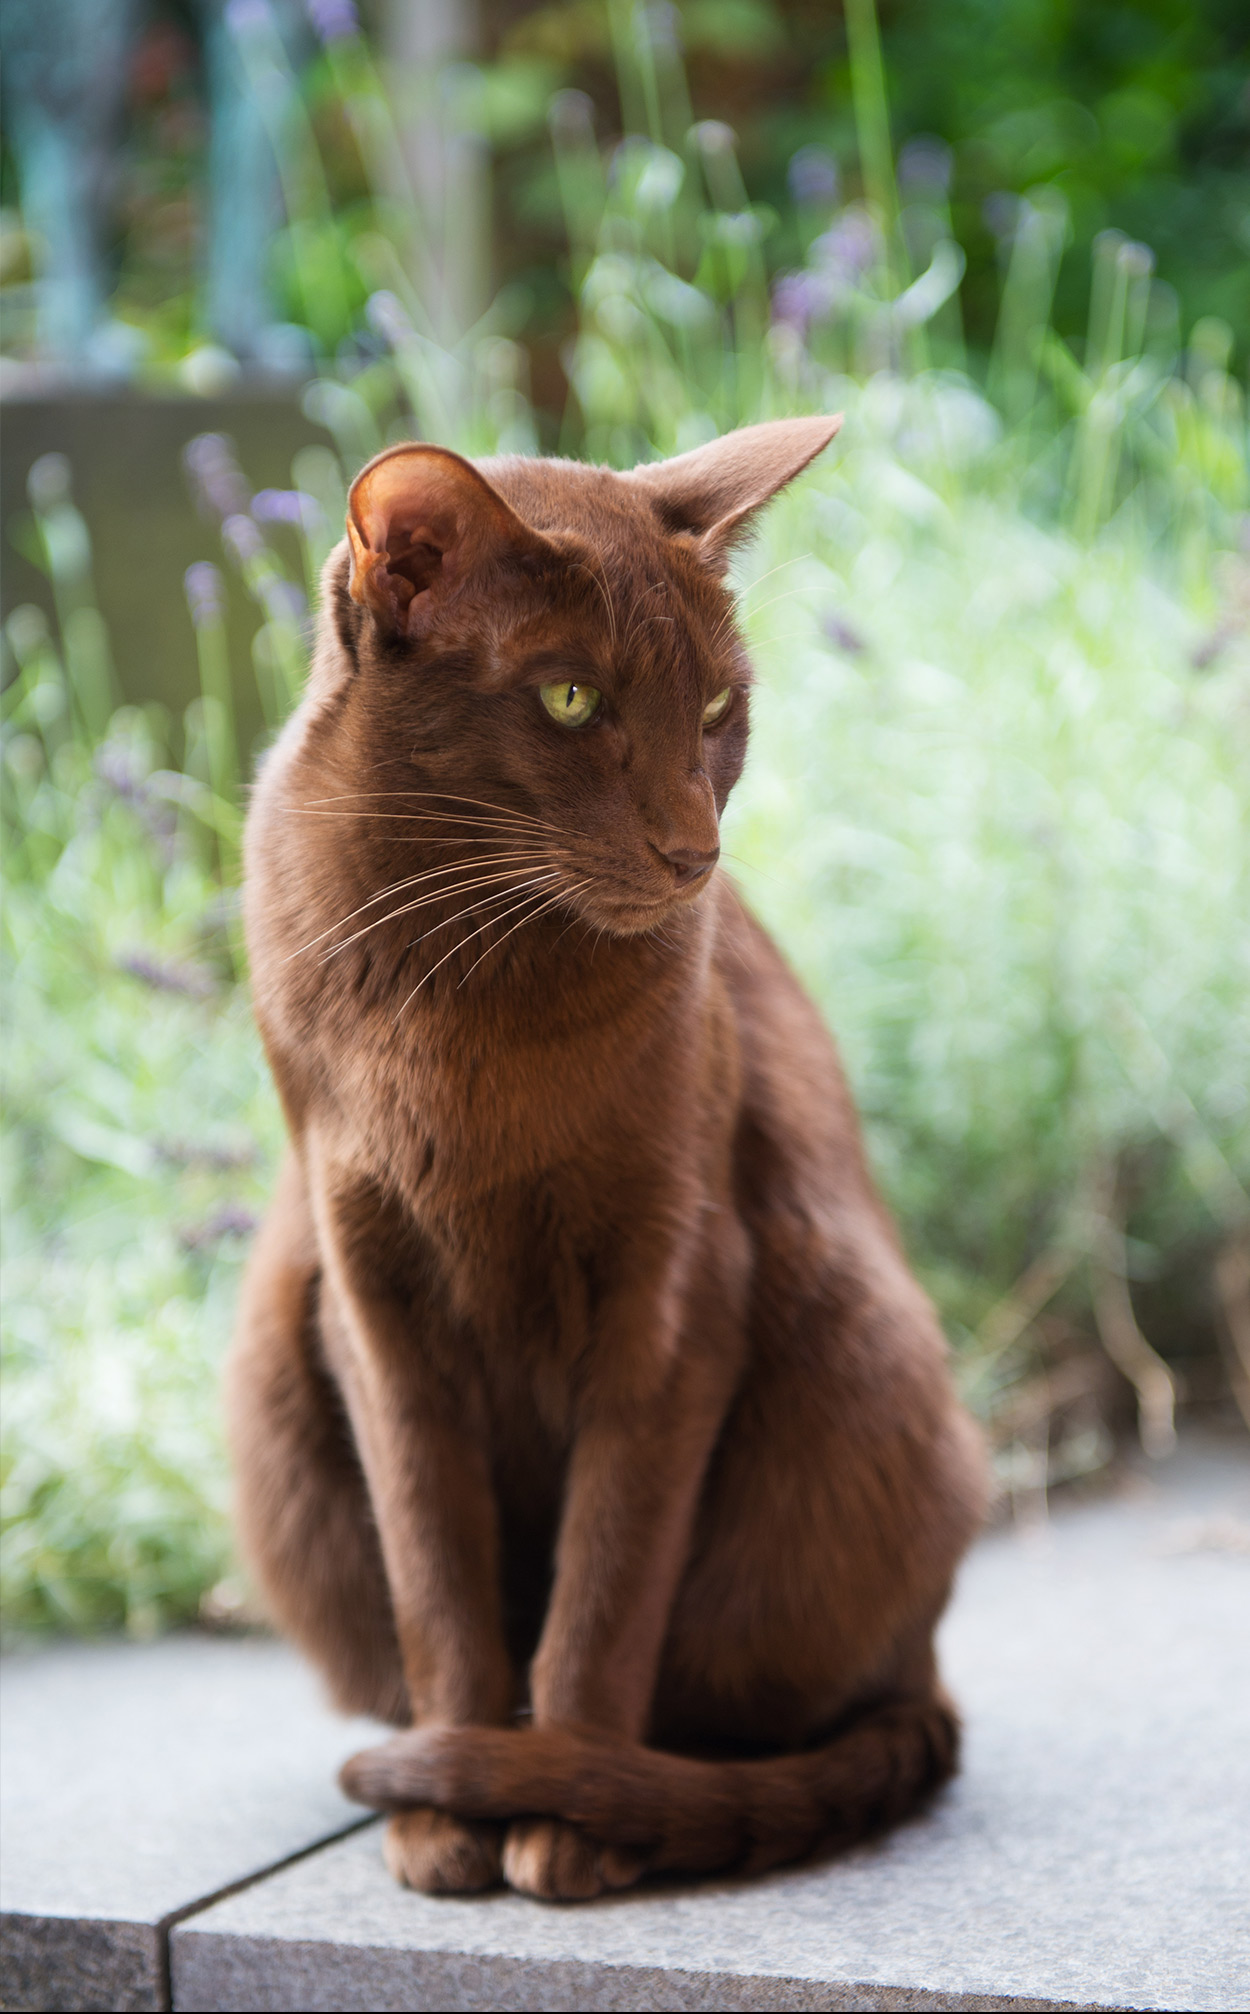 Havana Brown Cat - Your Complete Guide To The Rare Havana ...